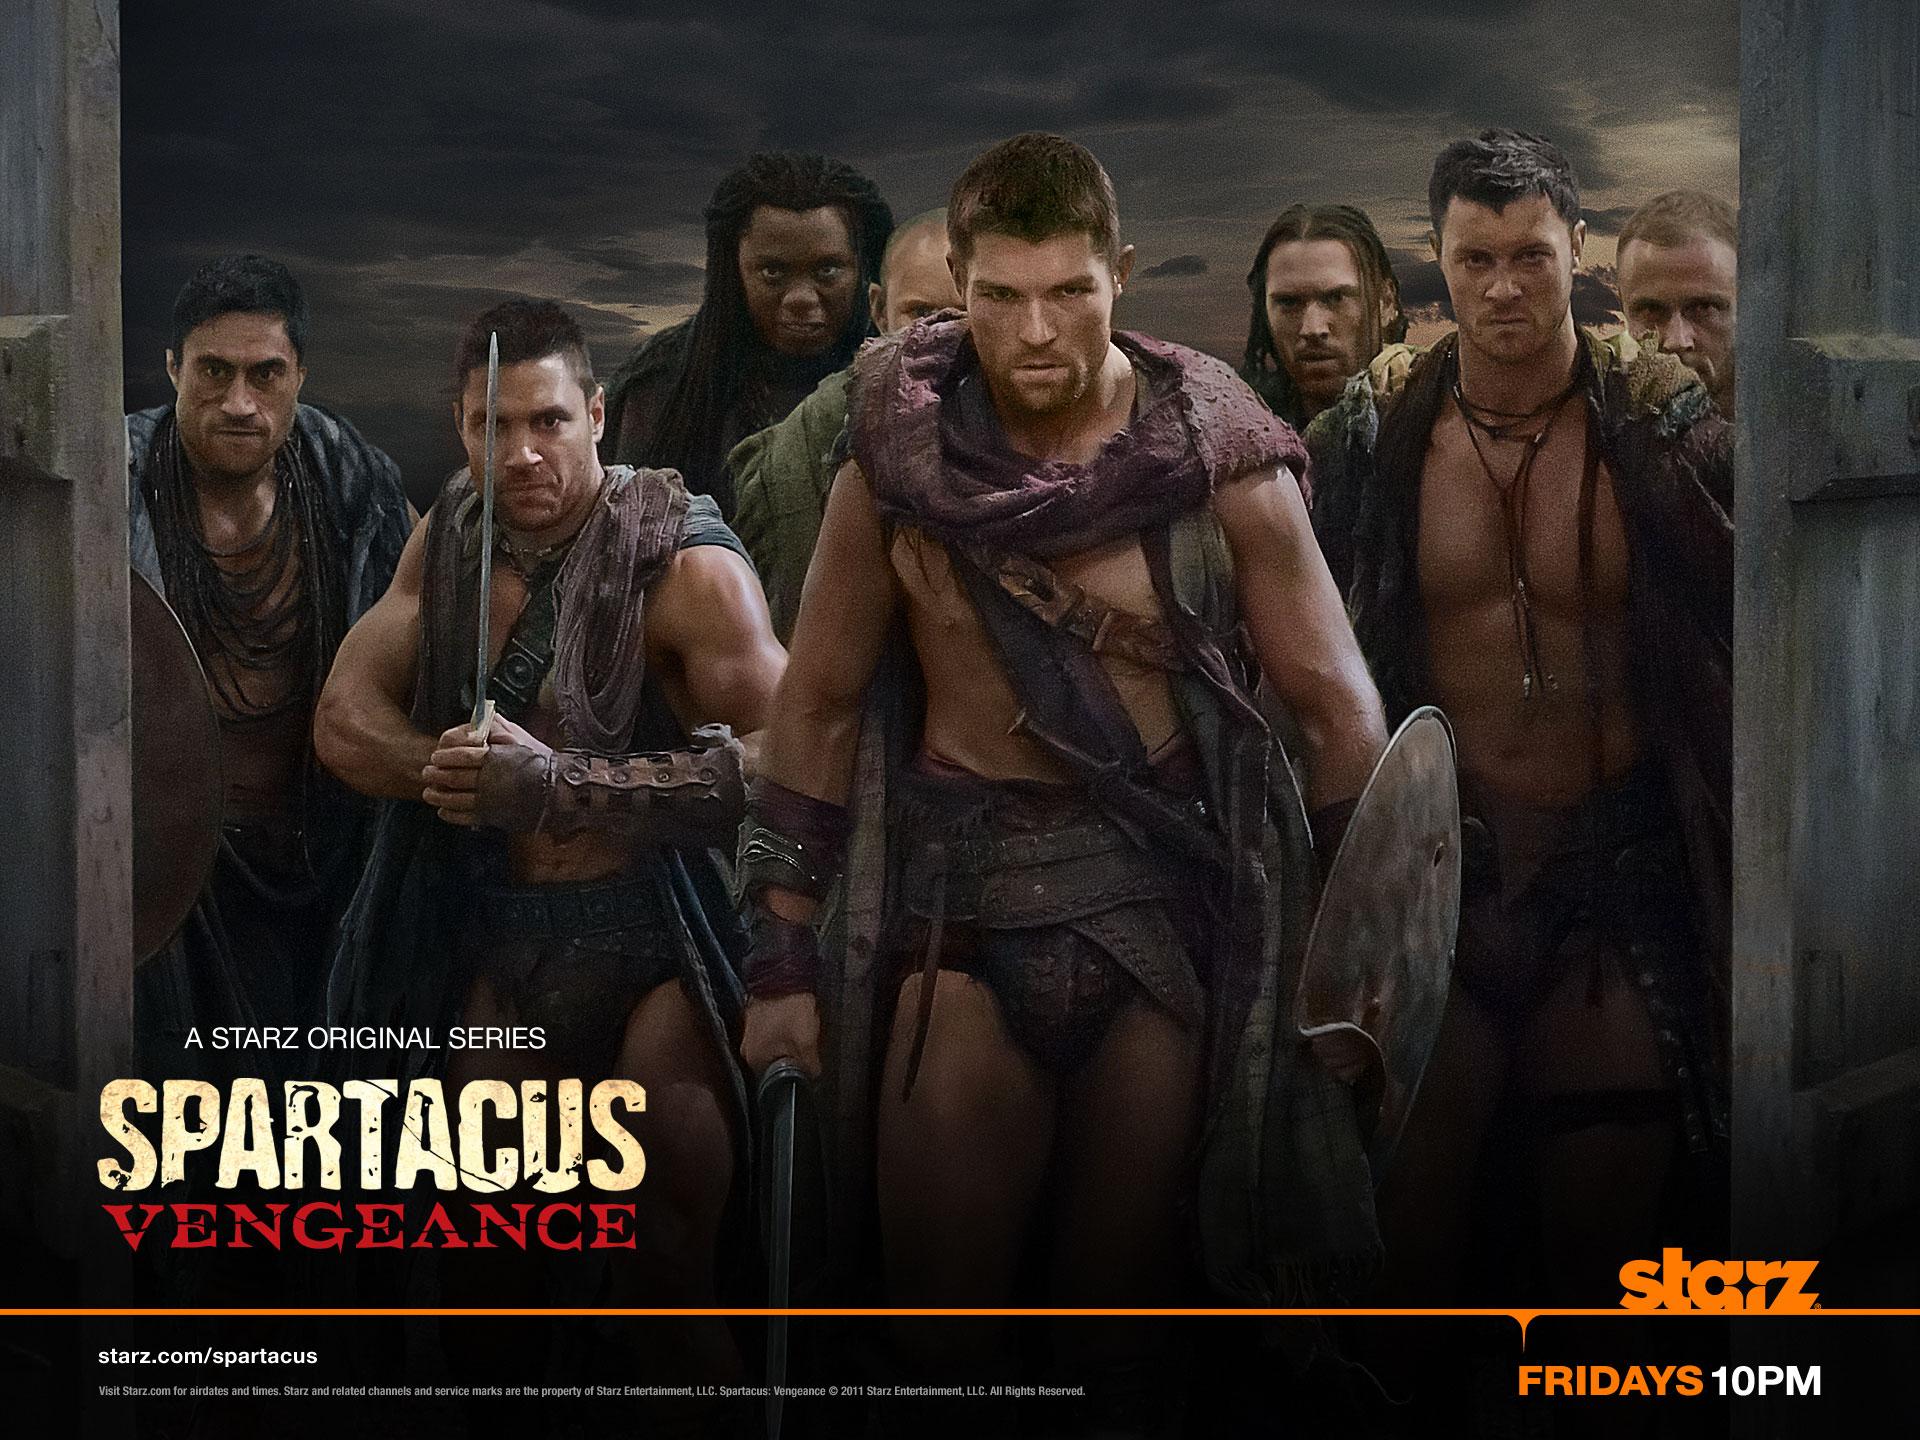 exclusive: spartacus: vengeance desktop wallpaper | convention scene